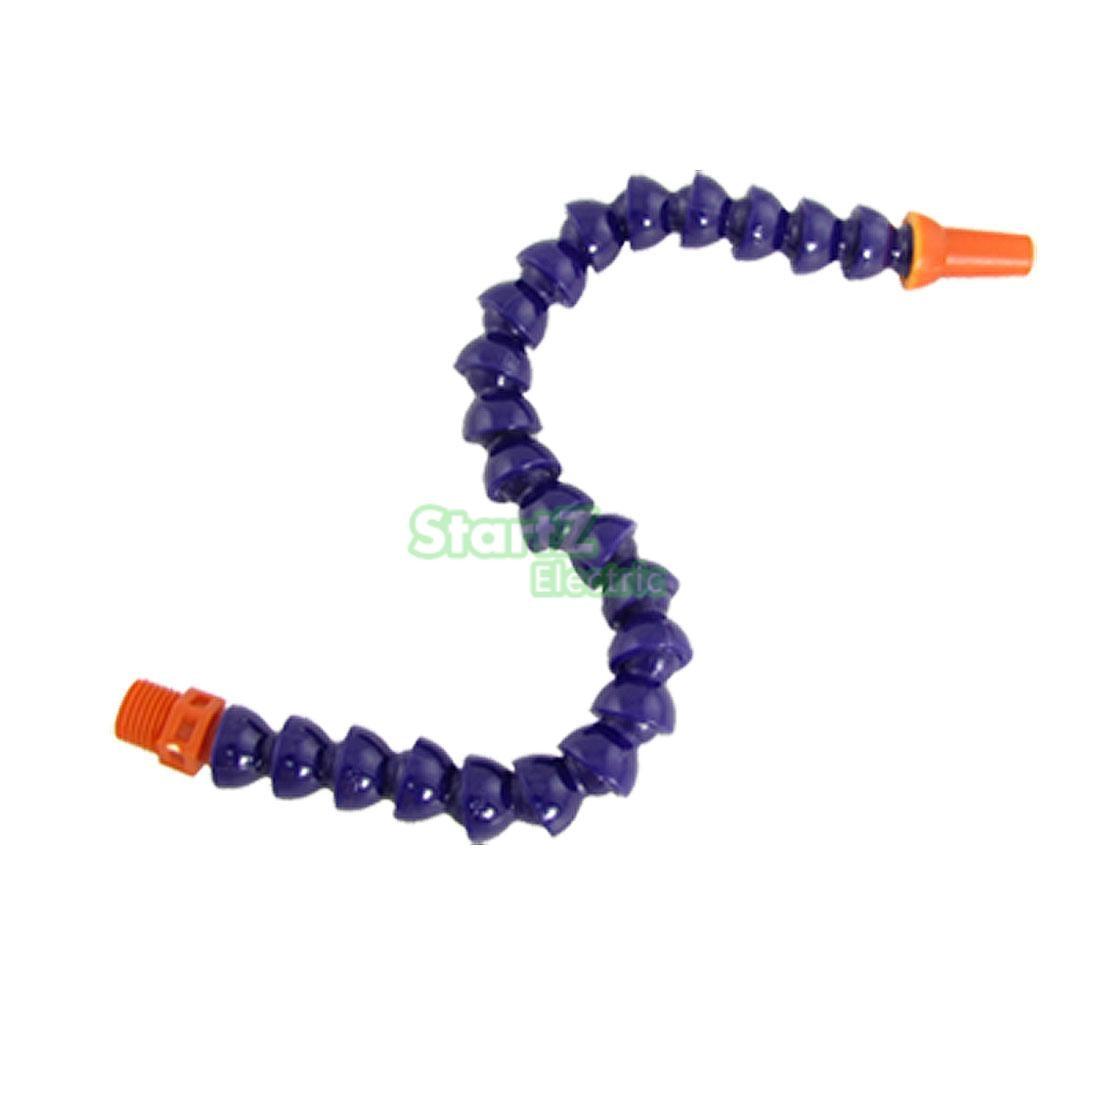 1/4 Round Nozzle Coolant Oil Hose Purple for Lathe Milling 1 pc 1 4 30cm round nozzle adjustable flexible water oil coolant pipe hose switch